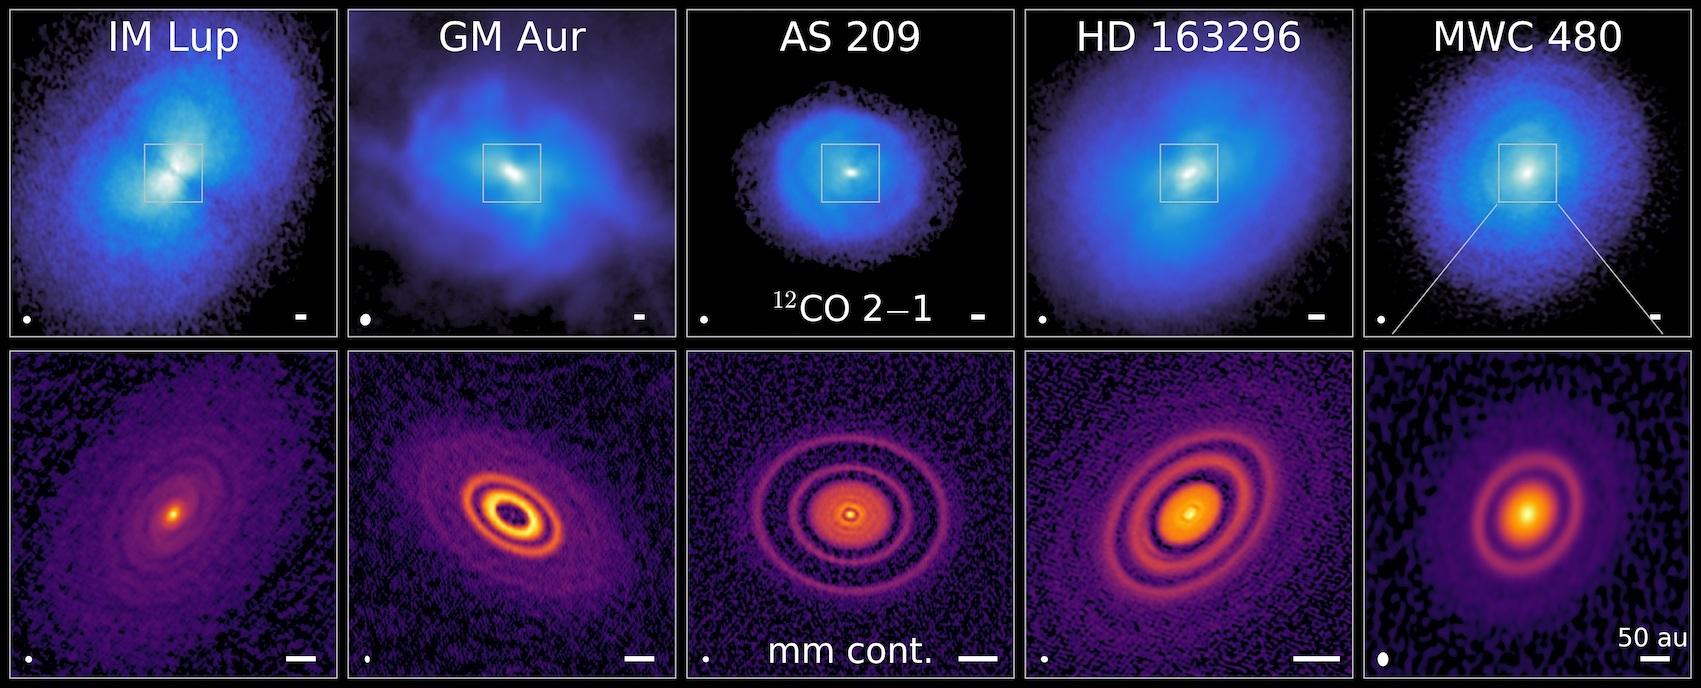 Rappresentazione dei dischi circumstellari studiati per ottenere MAPS